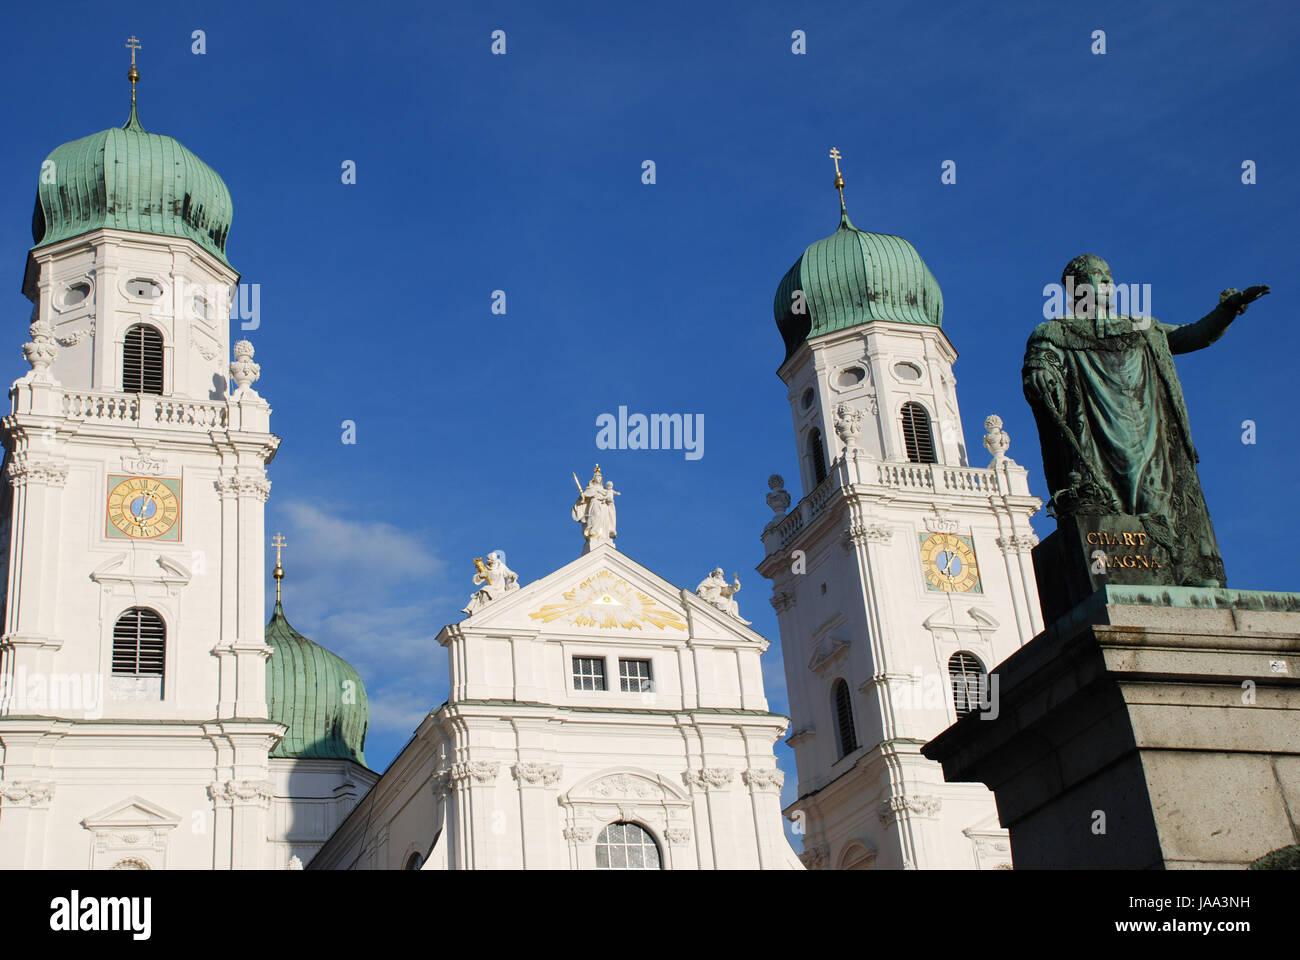 Denkmal, Kathedrale, Barock, Universität, Bildungseinrichtung, pädagogische Stockbild